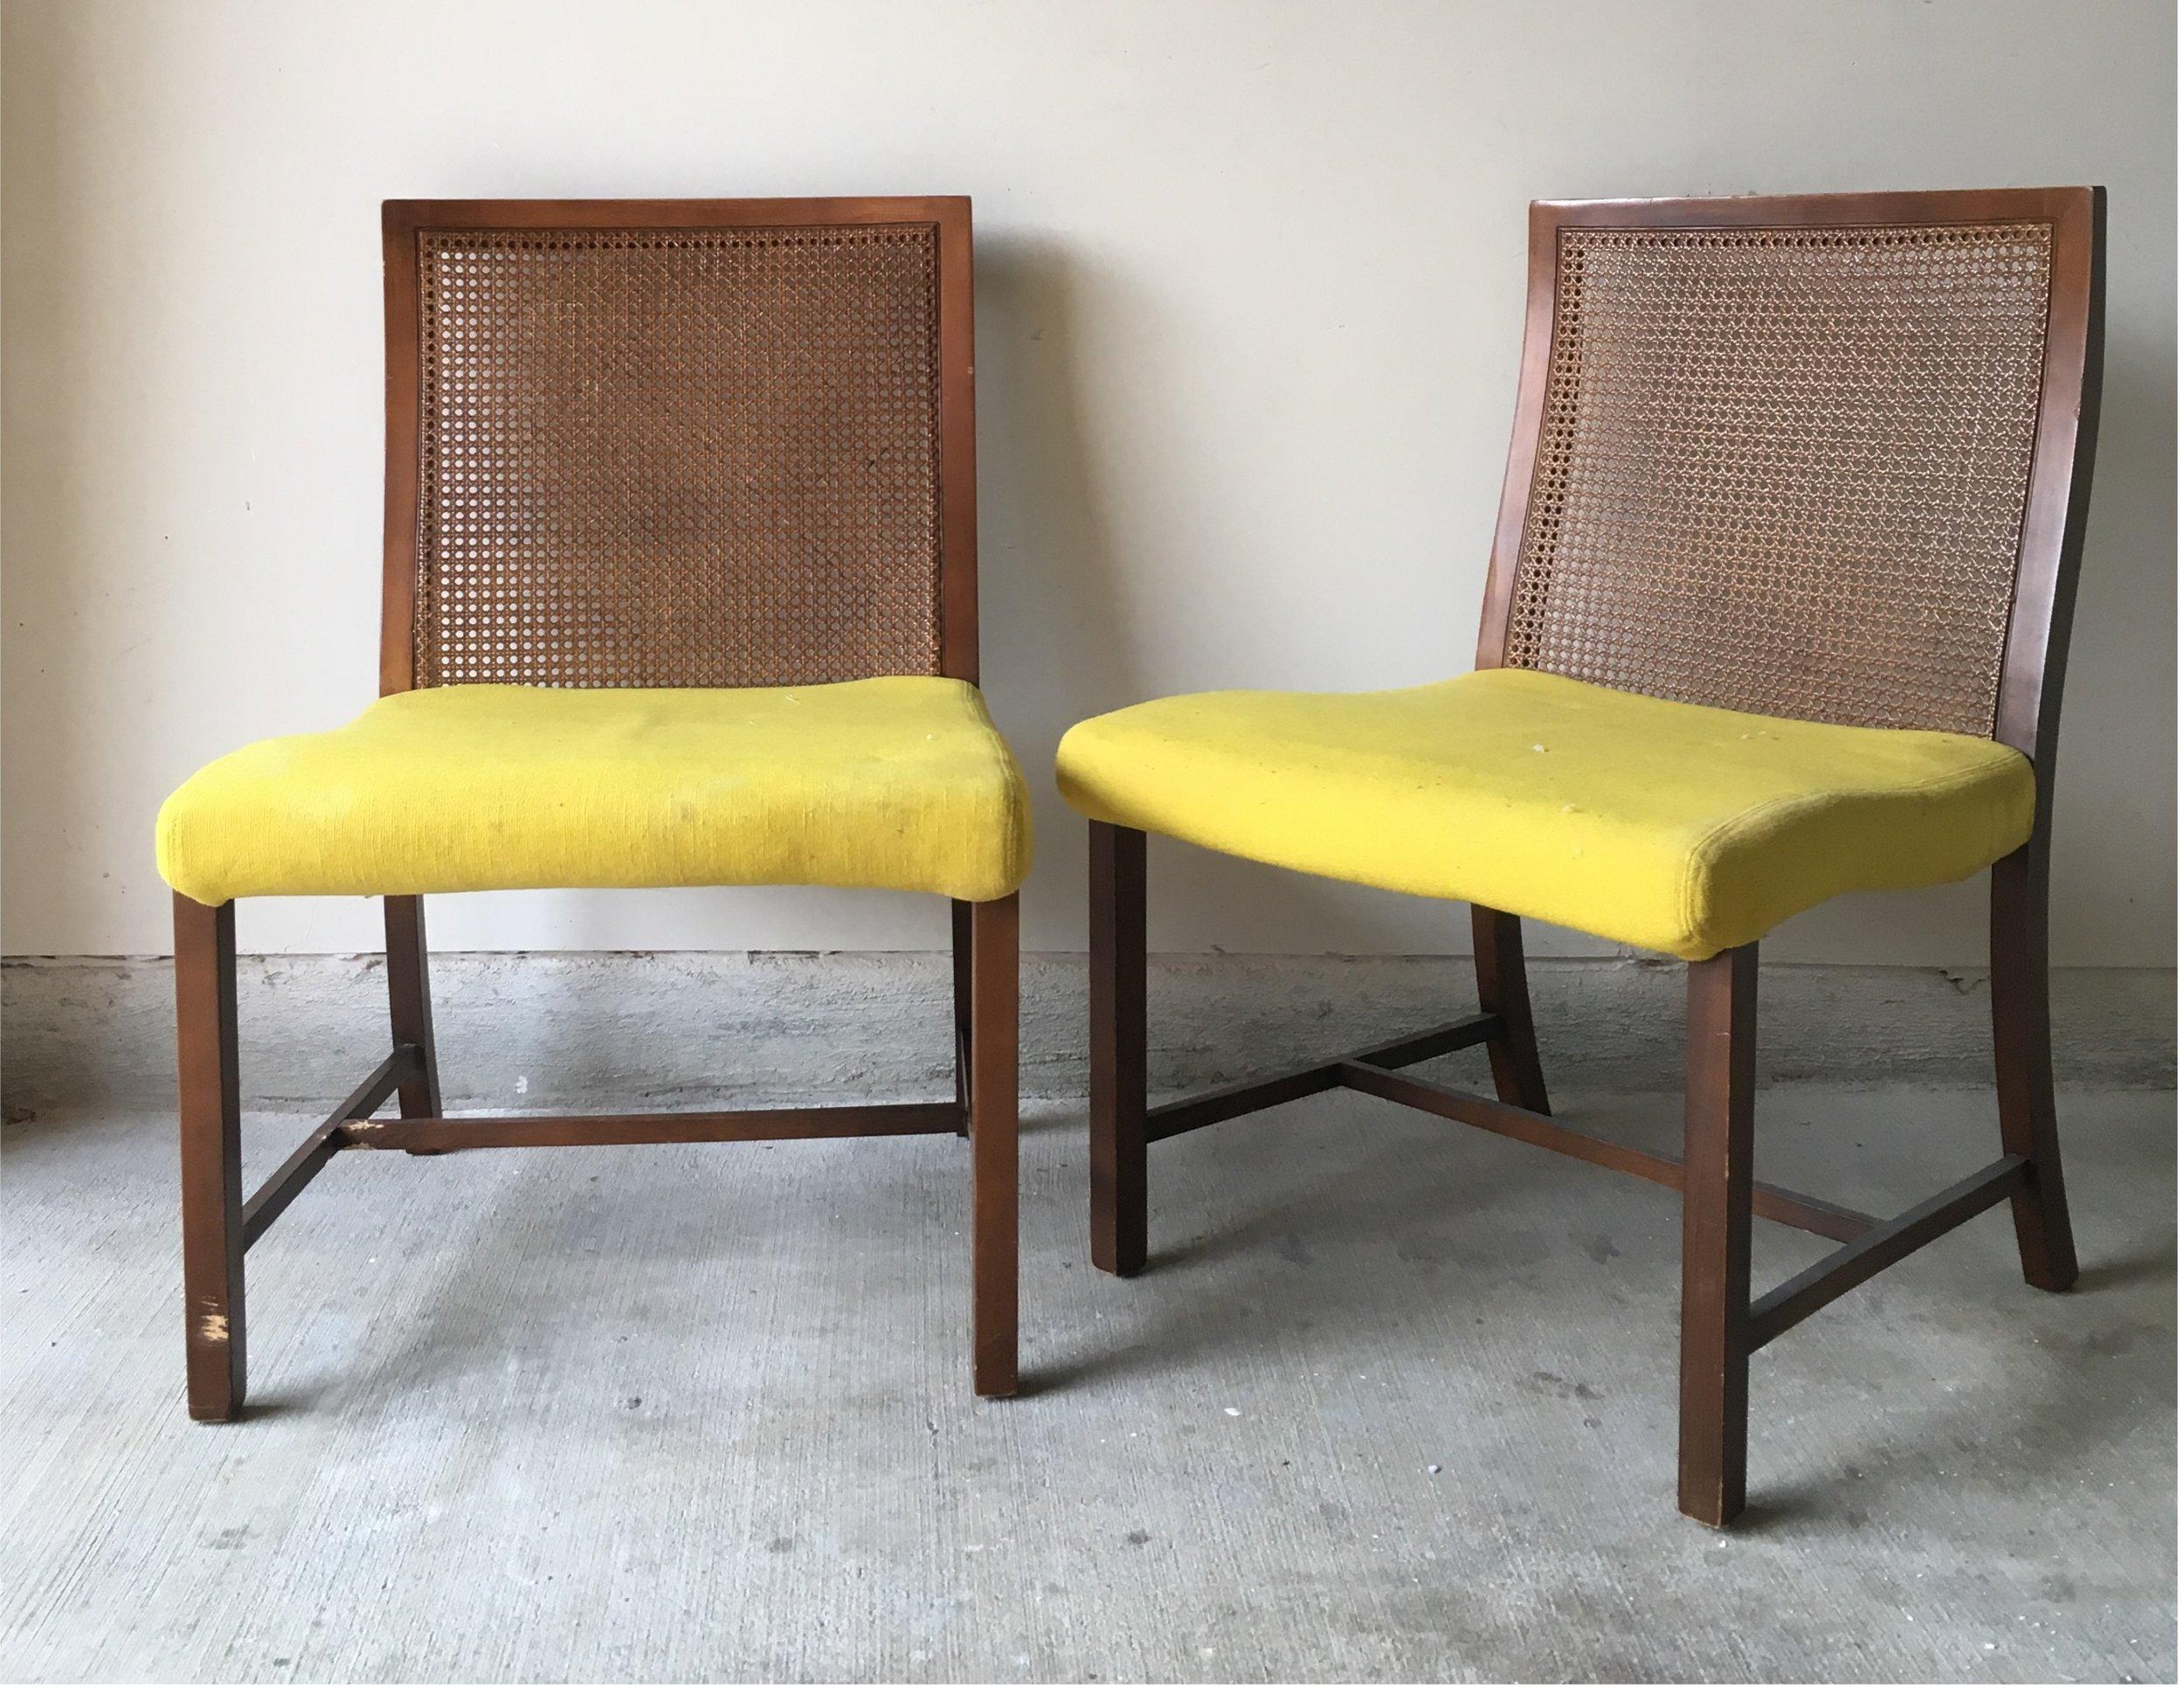 No.3: Cane Slipper Chairs